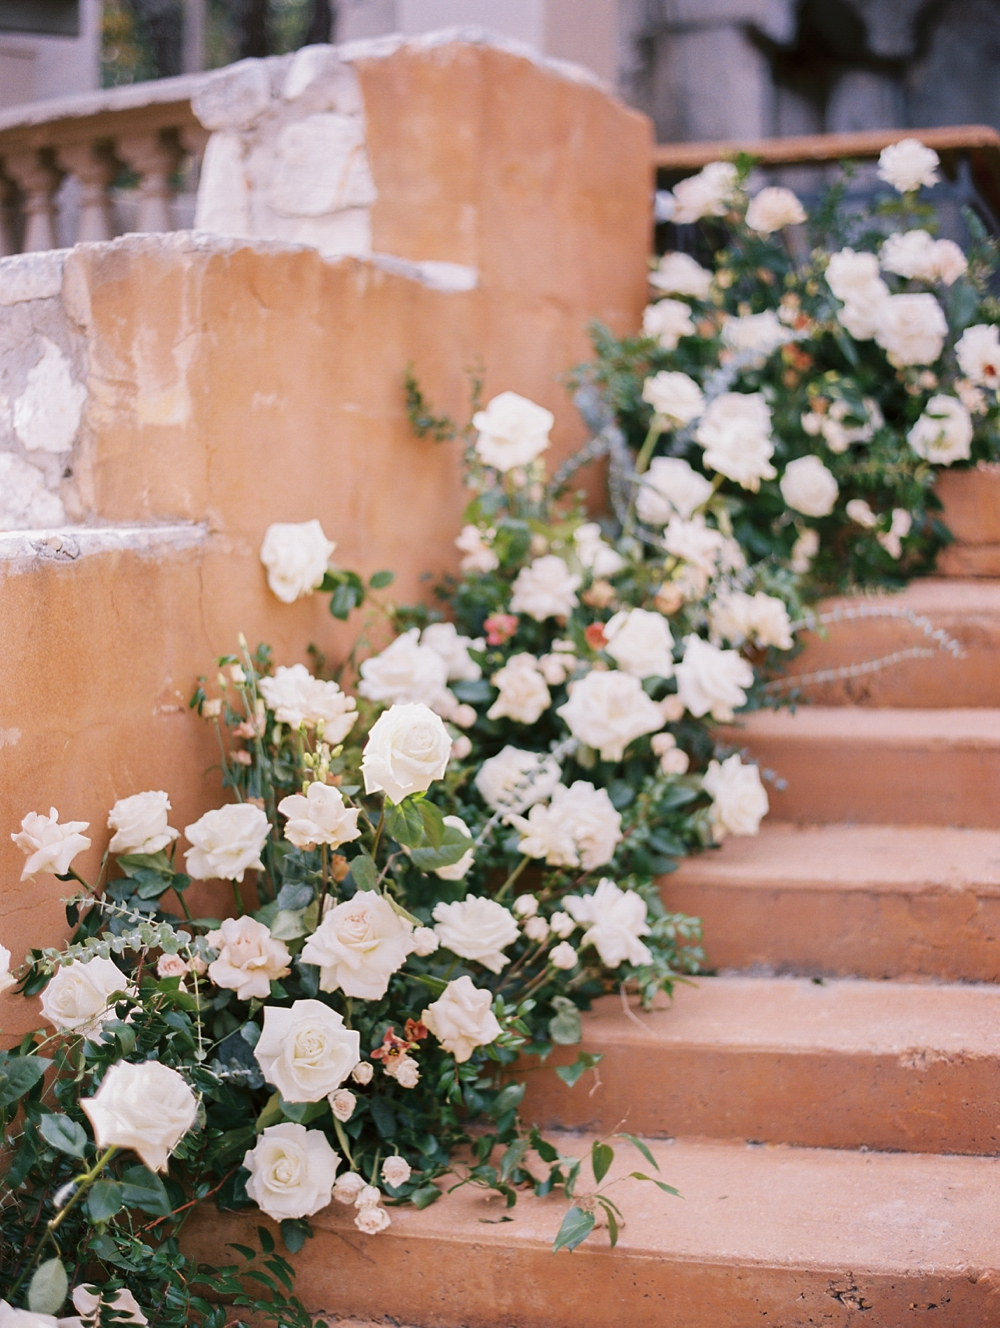 kristin-la-voie-photography-Austin-Wedding-Photographer-Villa-Antonia-195